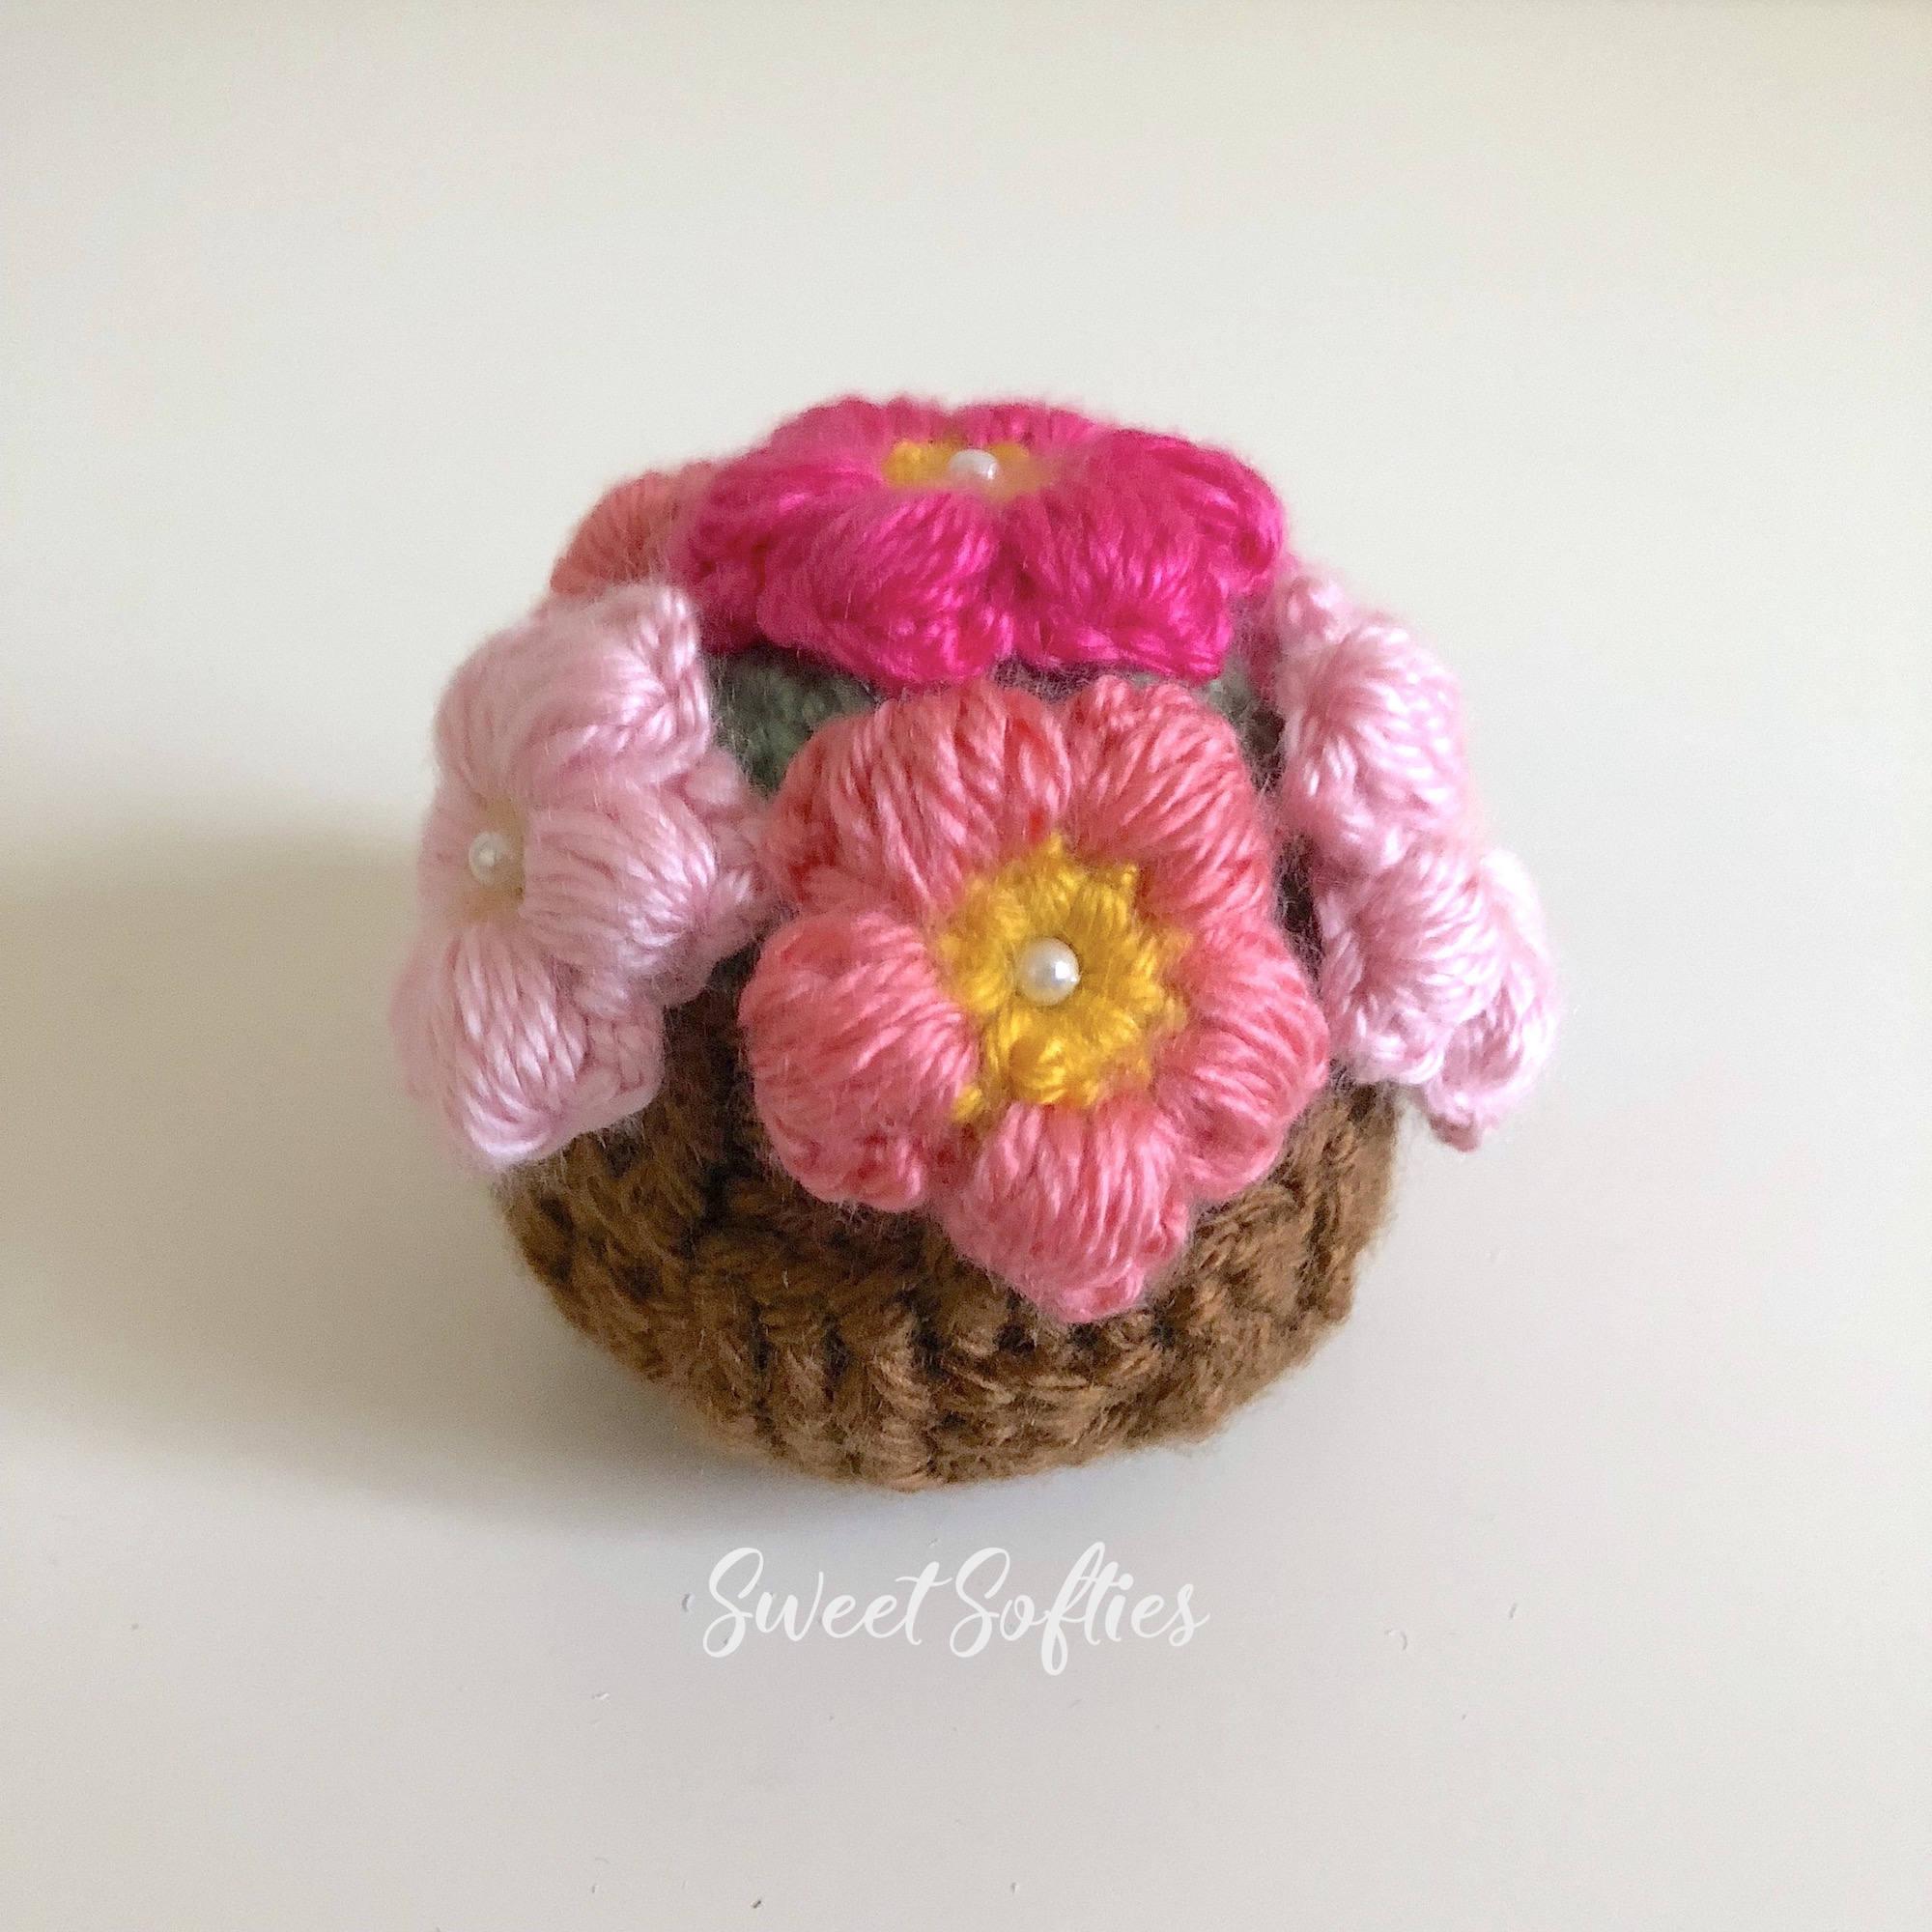 Free Amigurumi Crochet Pattern Tutorial: Loving